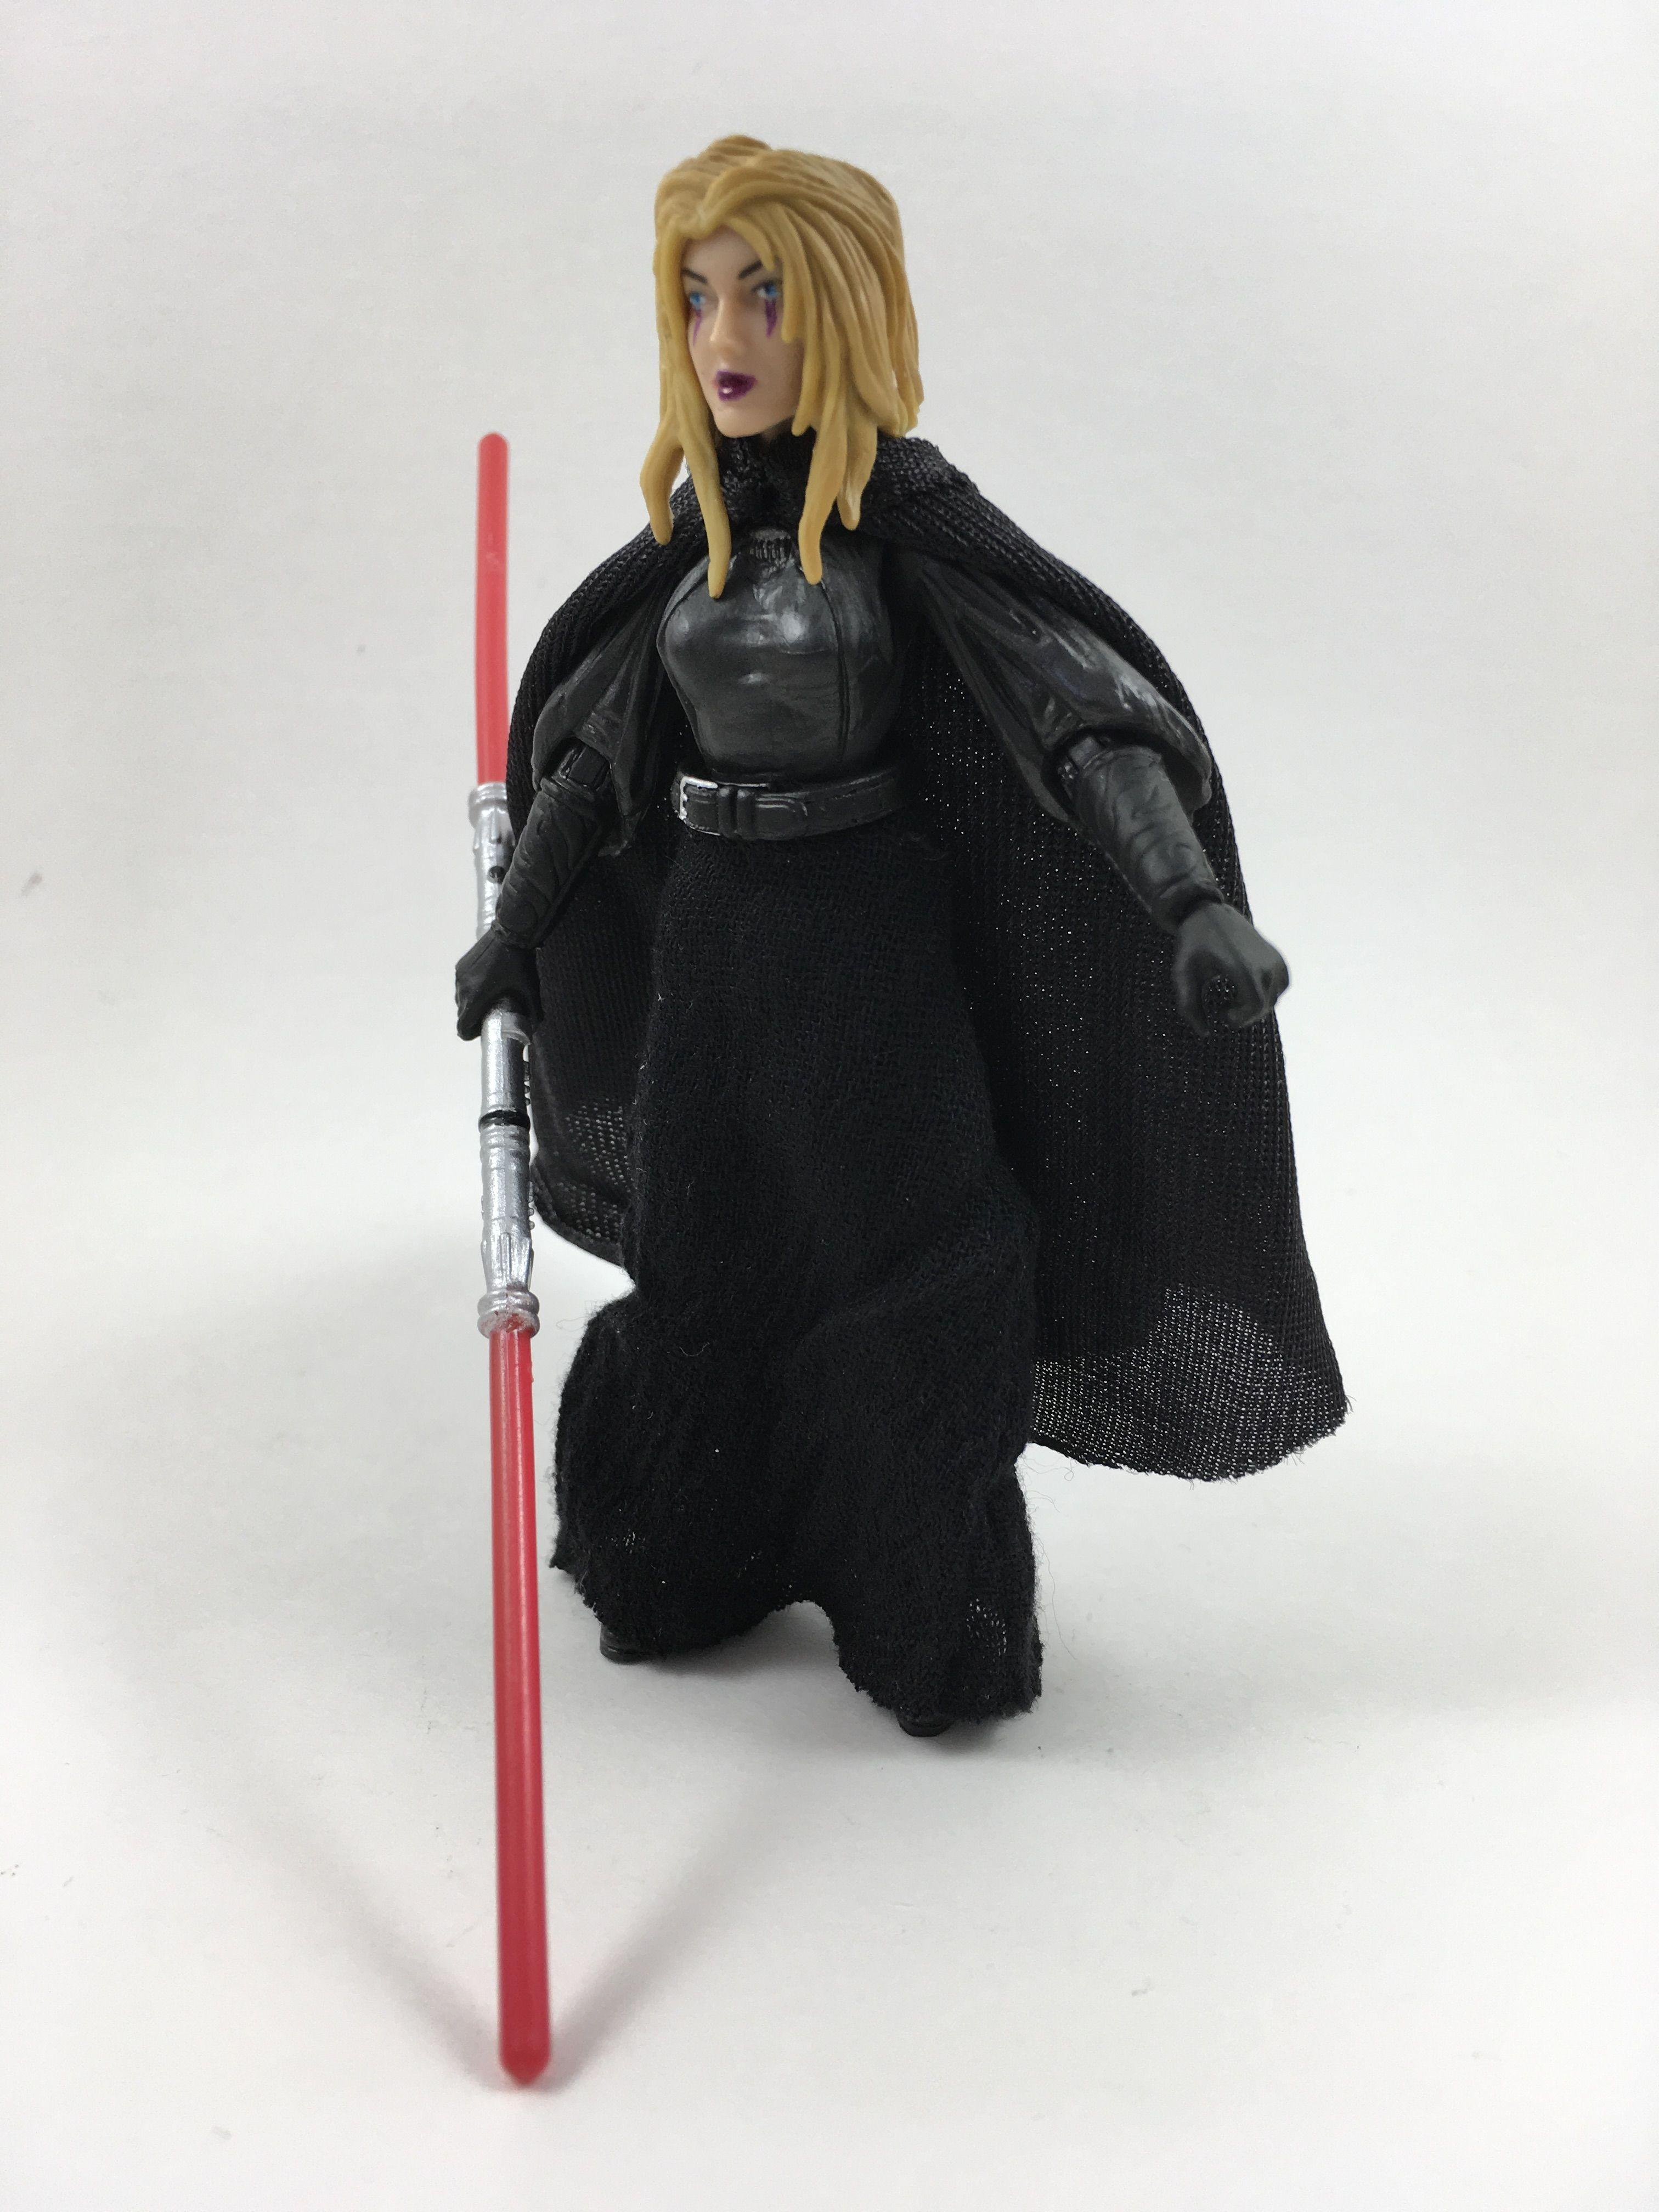 Custom Star Wars 6in Black Series Lowbacca figure sith jedi chewbacca jaina solo